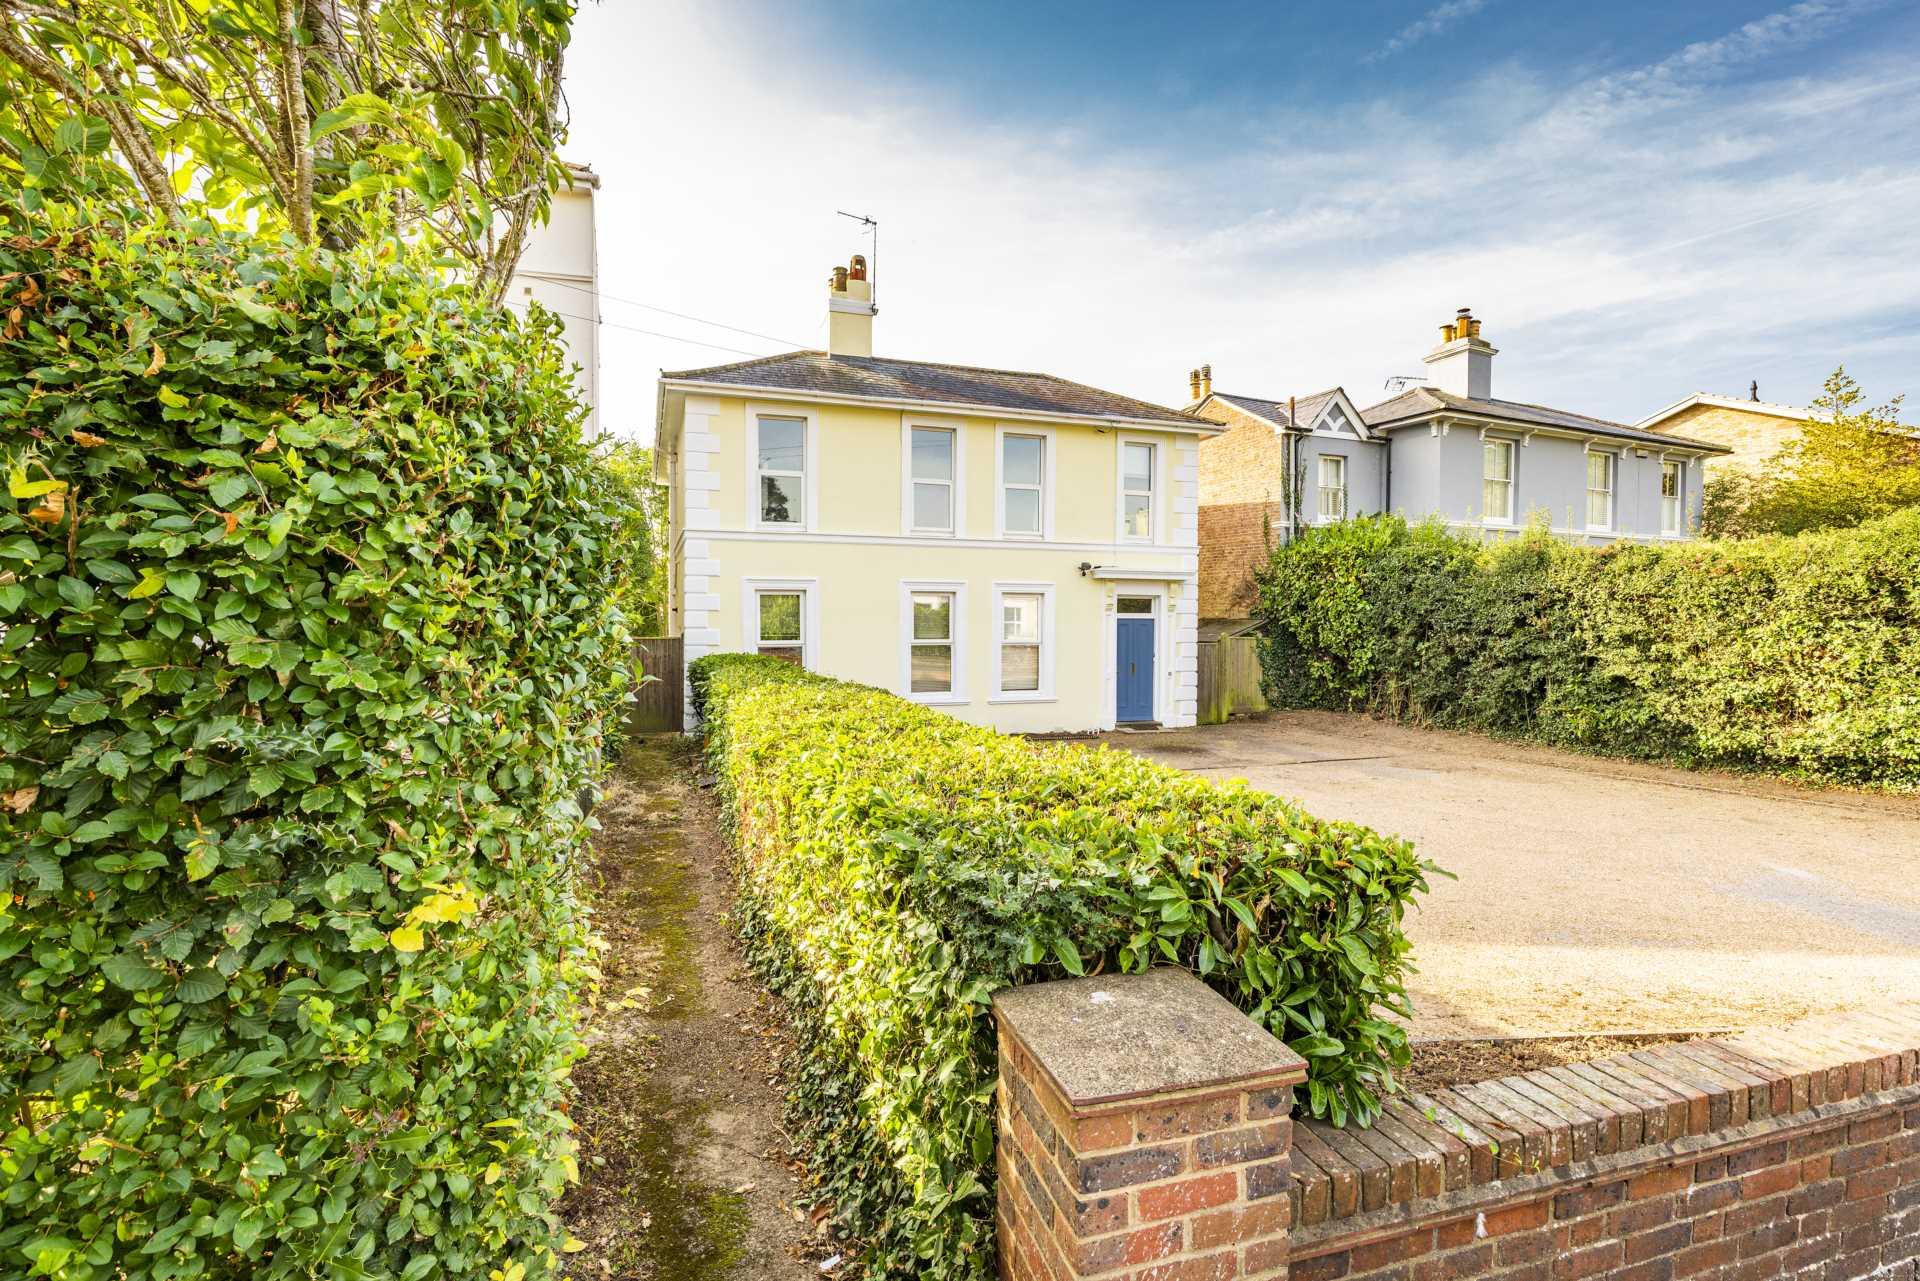 Park Road, Southborough, Tunbridge Wells, Image 17